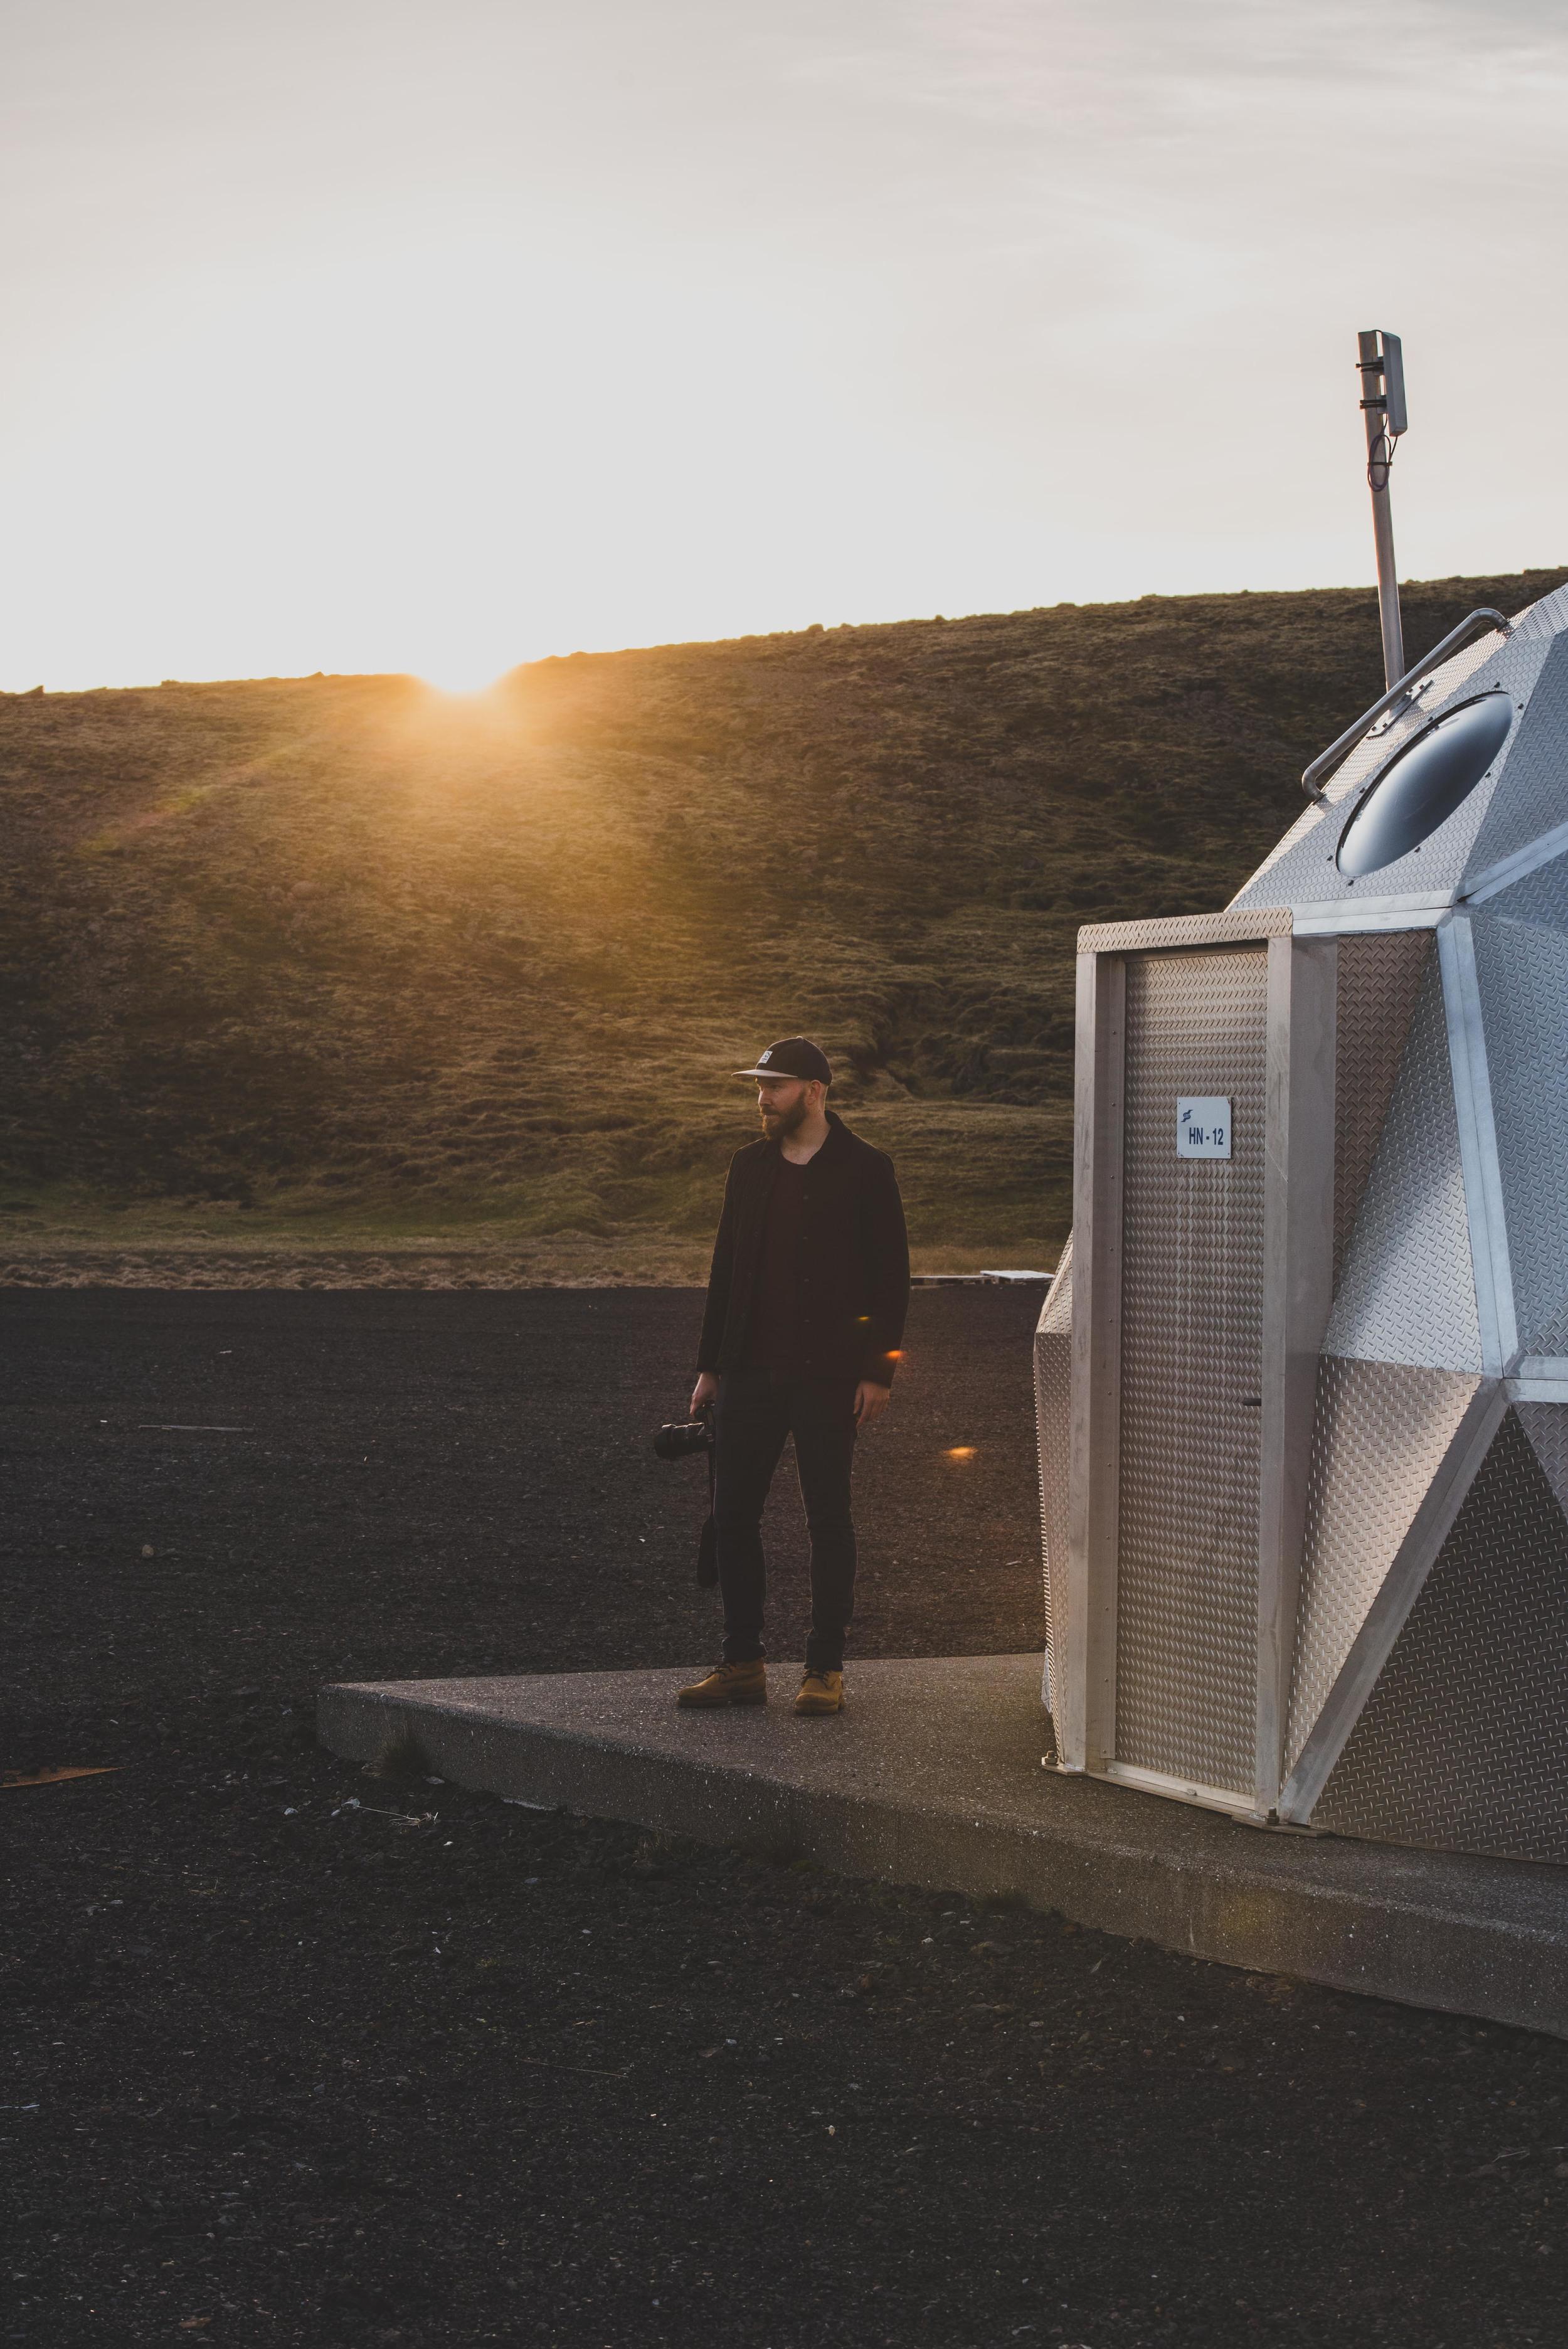 Joe Shutter Iceland Blogger Photographer Adventure-7.jpg